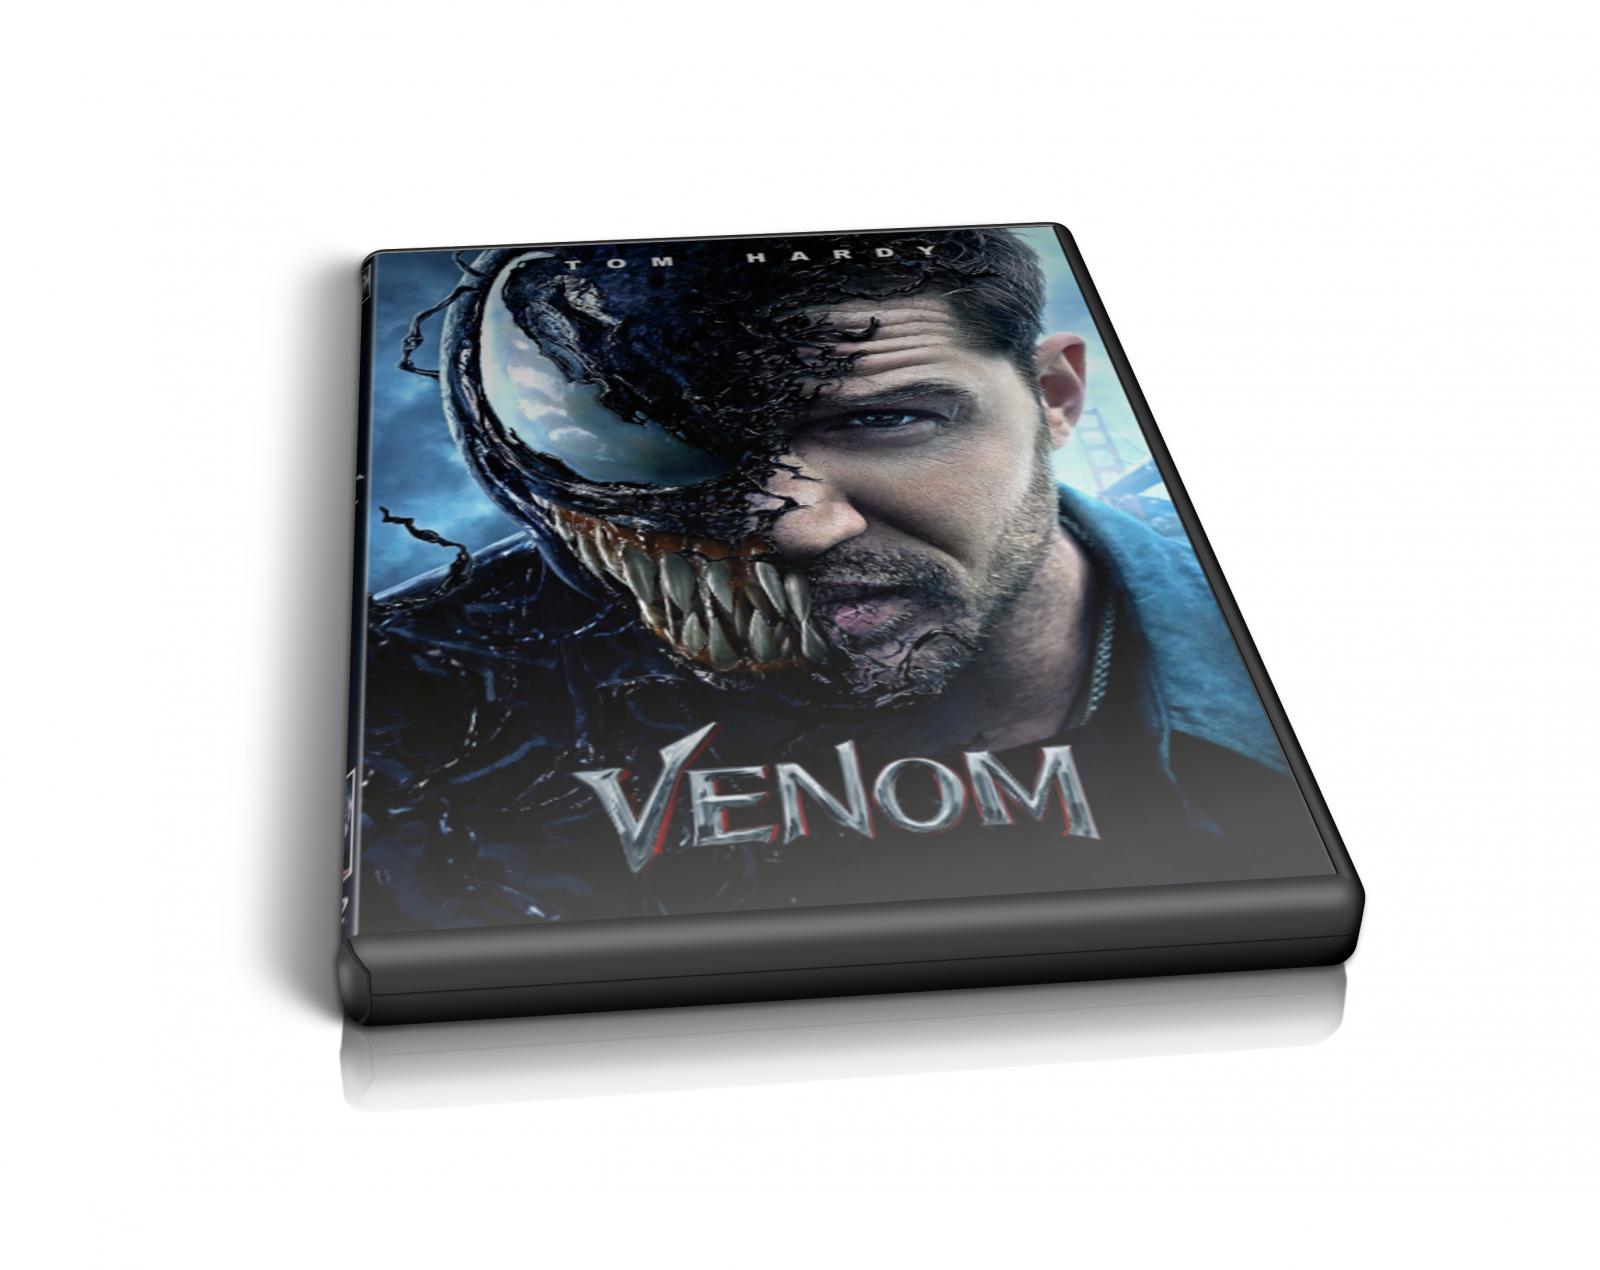 5cd278b16d2c2_Venom3.png